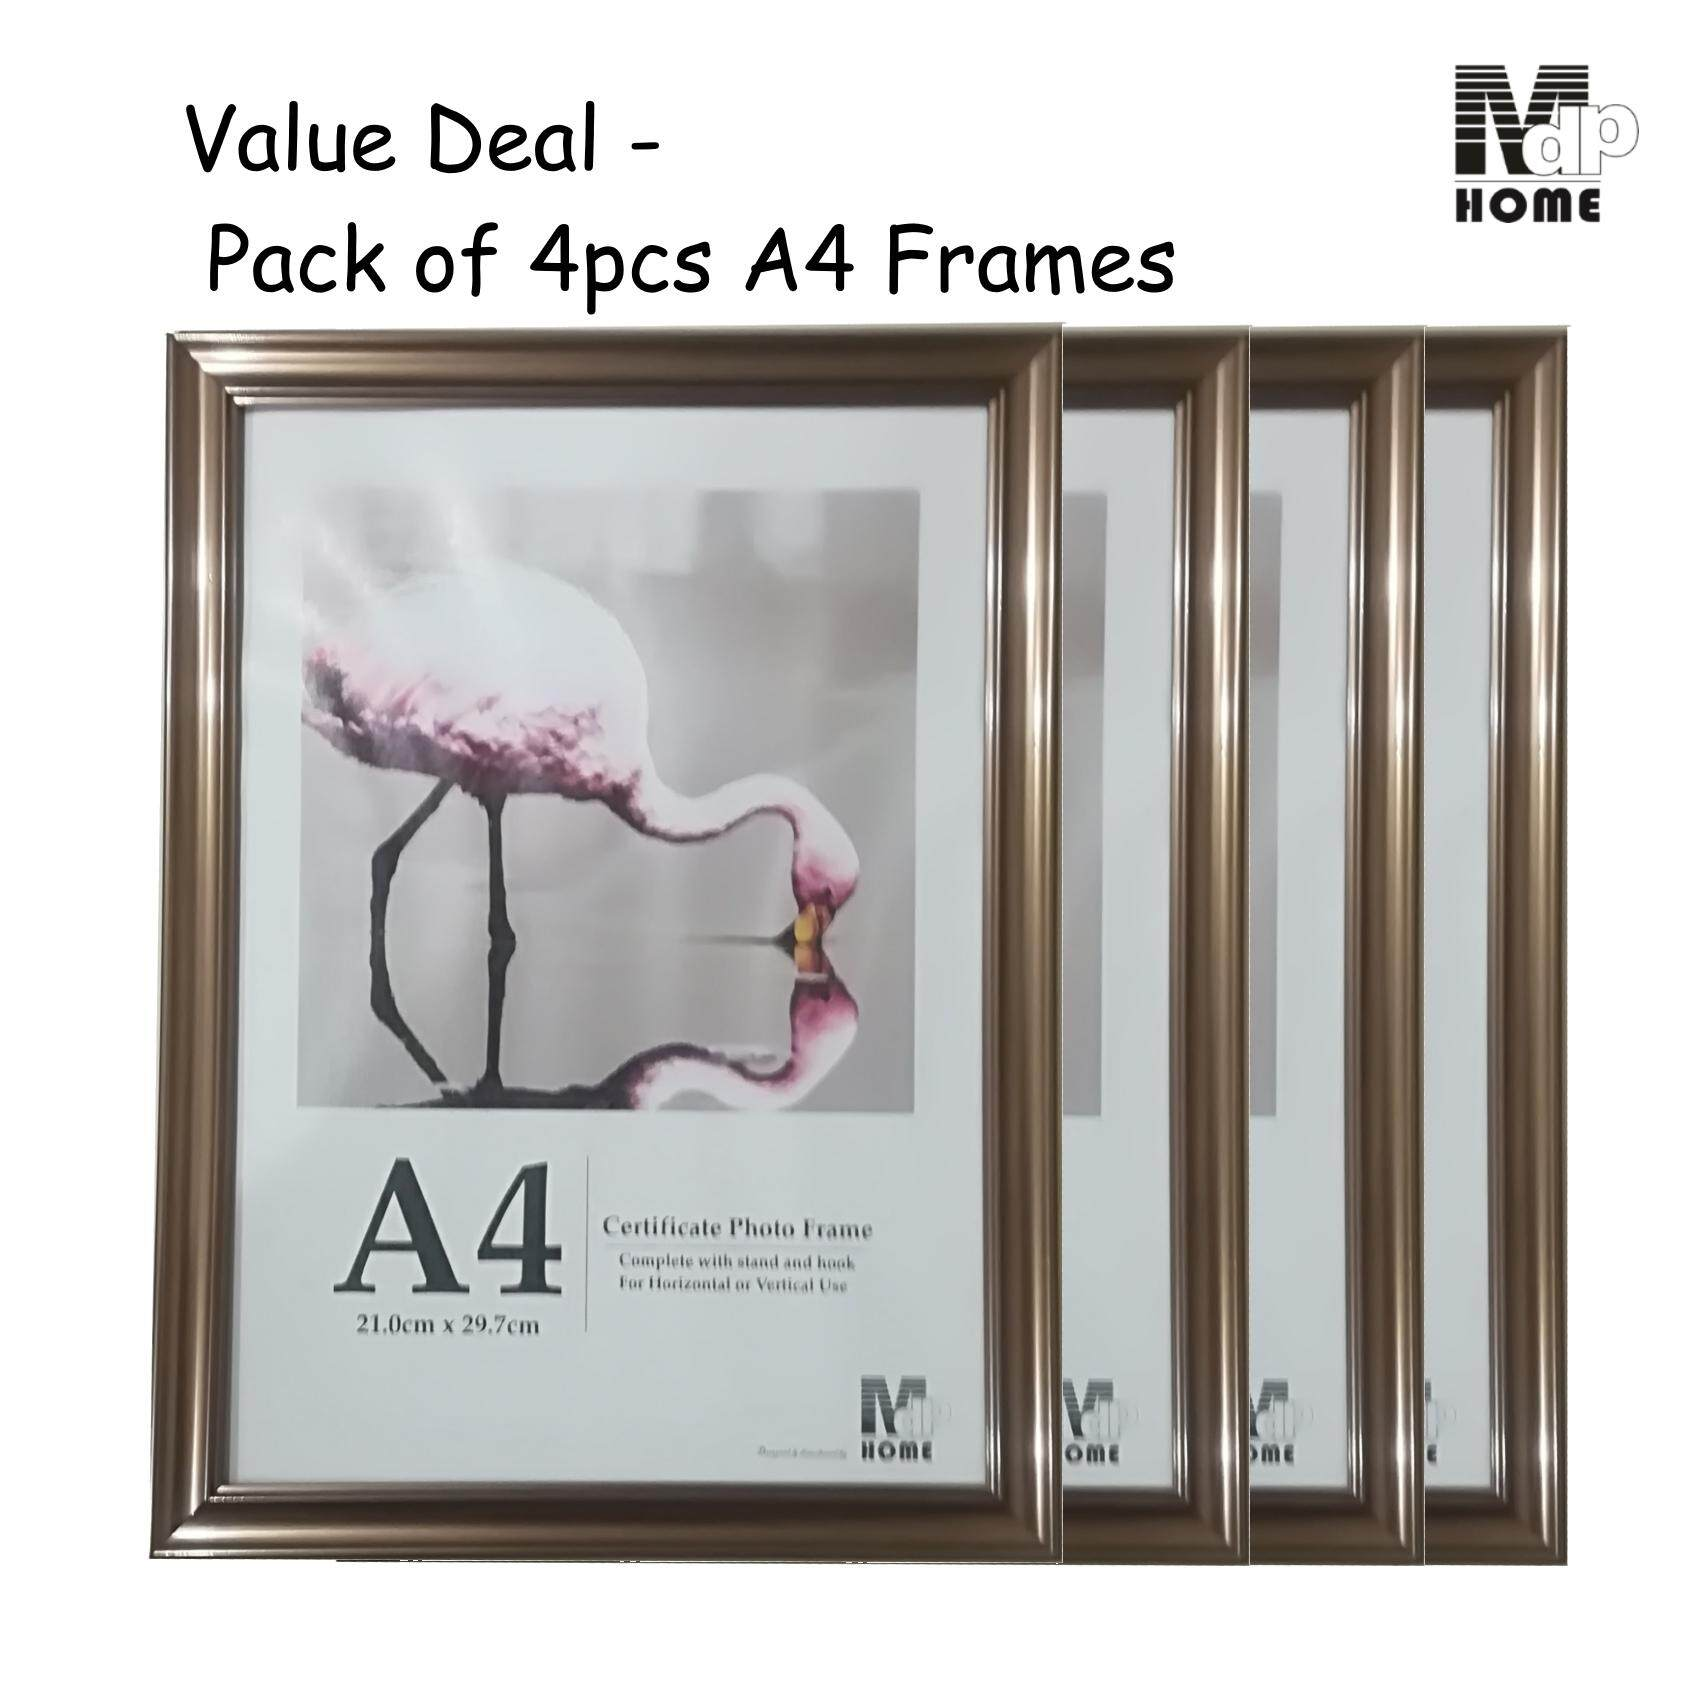 Attractive Frame 18x12 Gift - Framed Art Ideas - roadofriches.com